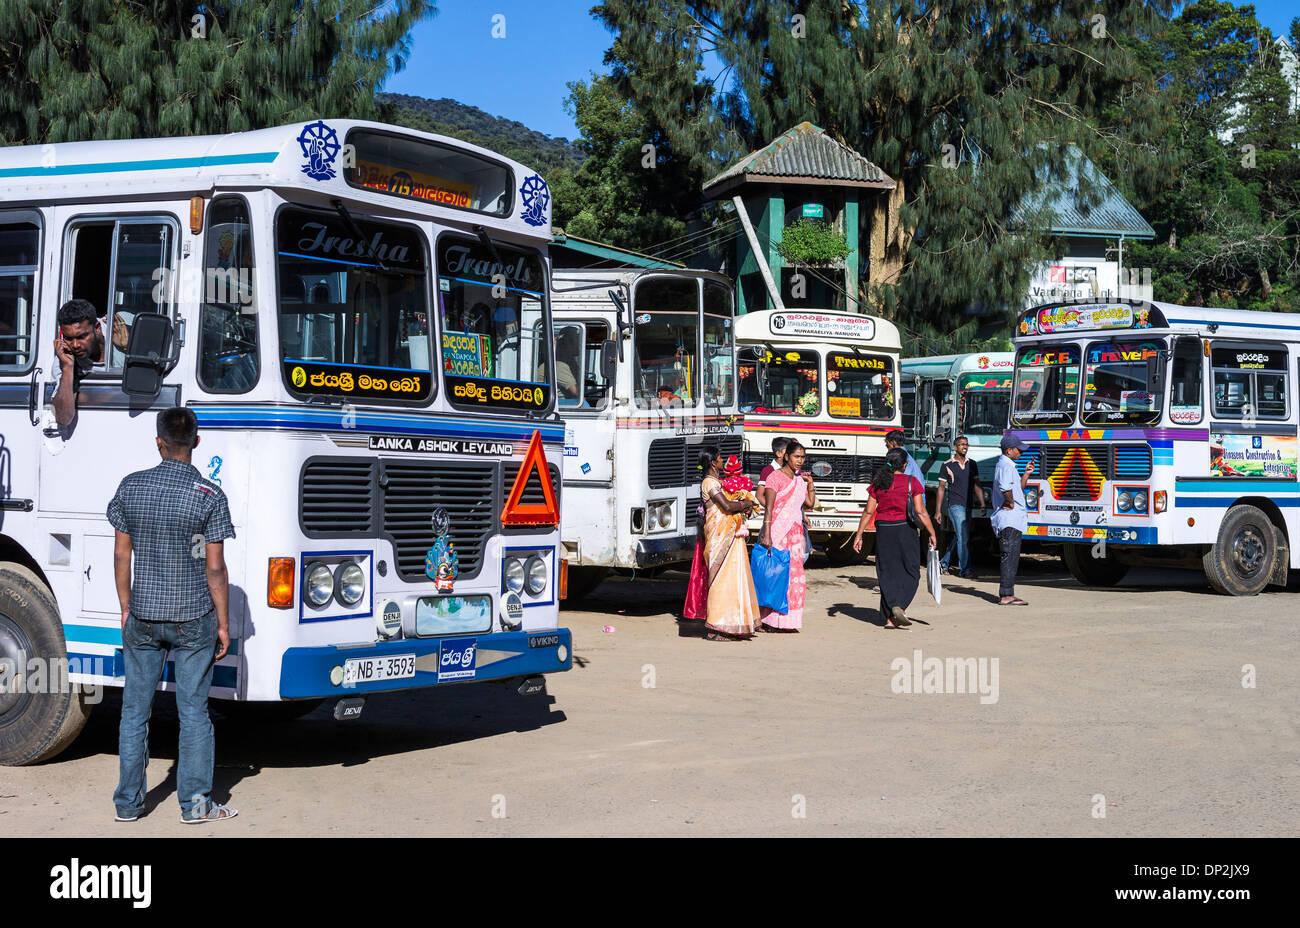 Sri Lanka, Nuwara Elija, local people in the bus station - Stock Image